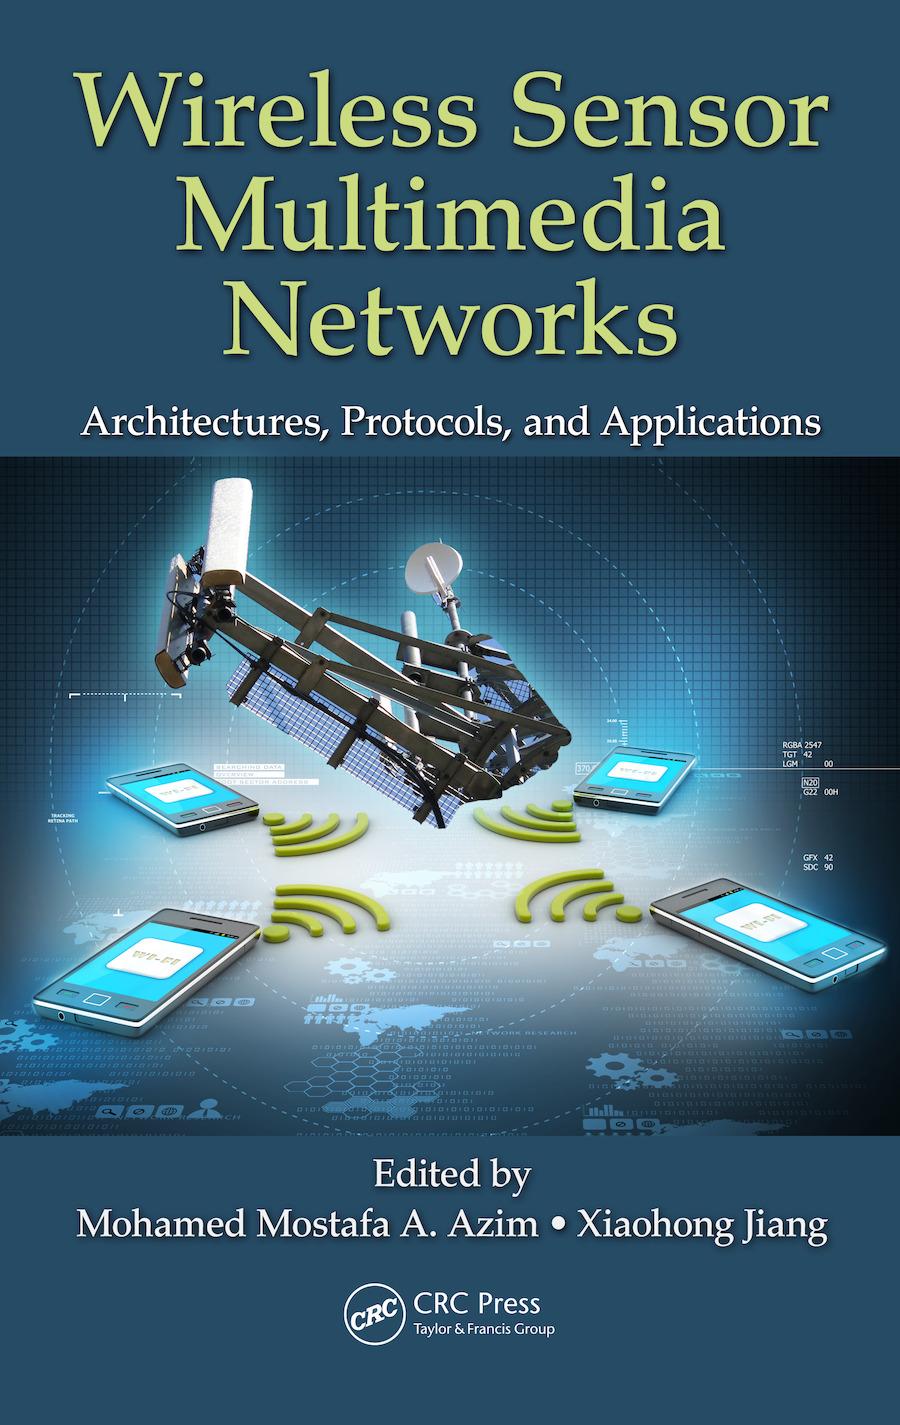 ADAPTATION TECHNIQUES FOR MULTIMEDIA COMMUNICATION IN WIRELESS SENSOR NETWORKS PI NA R SA R ISA R AY-BOLU K